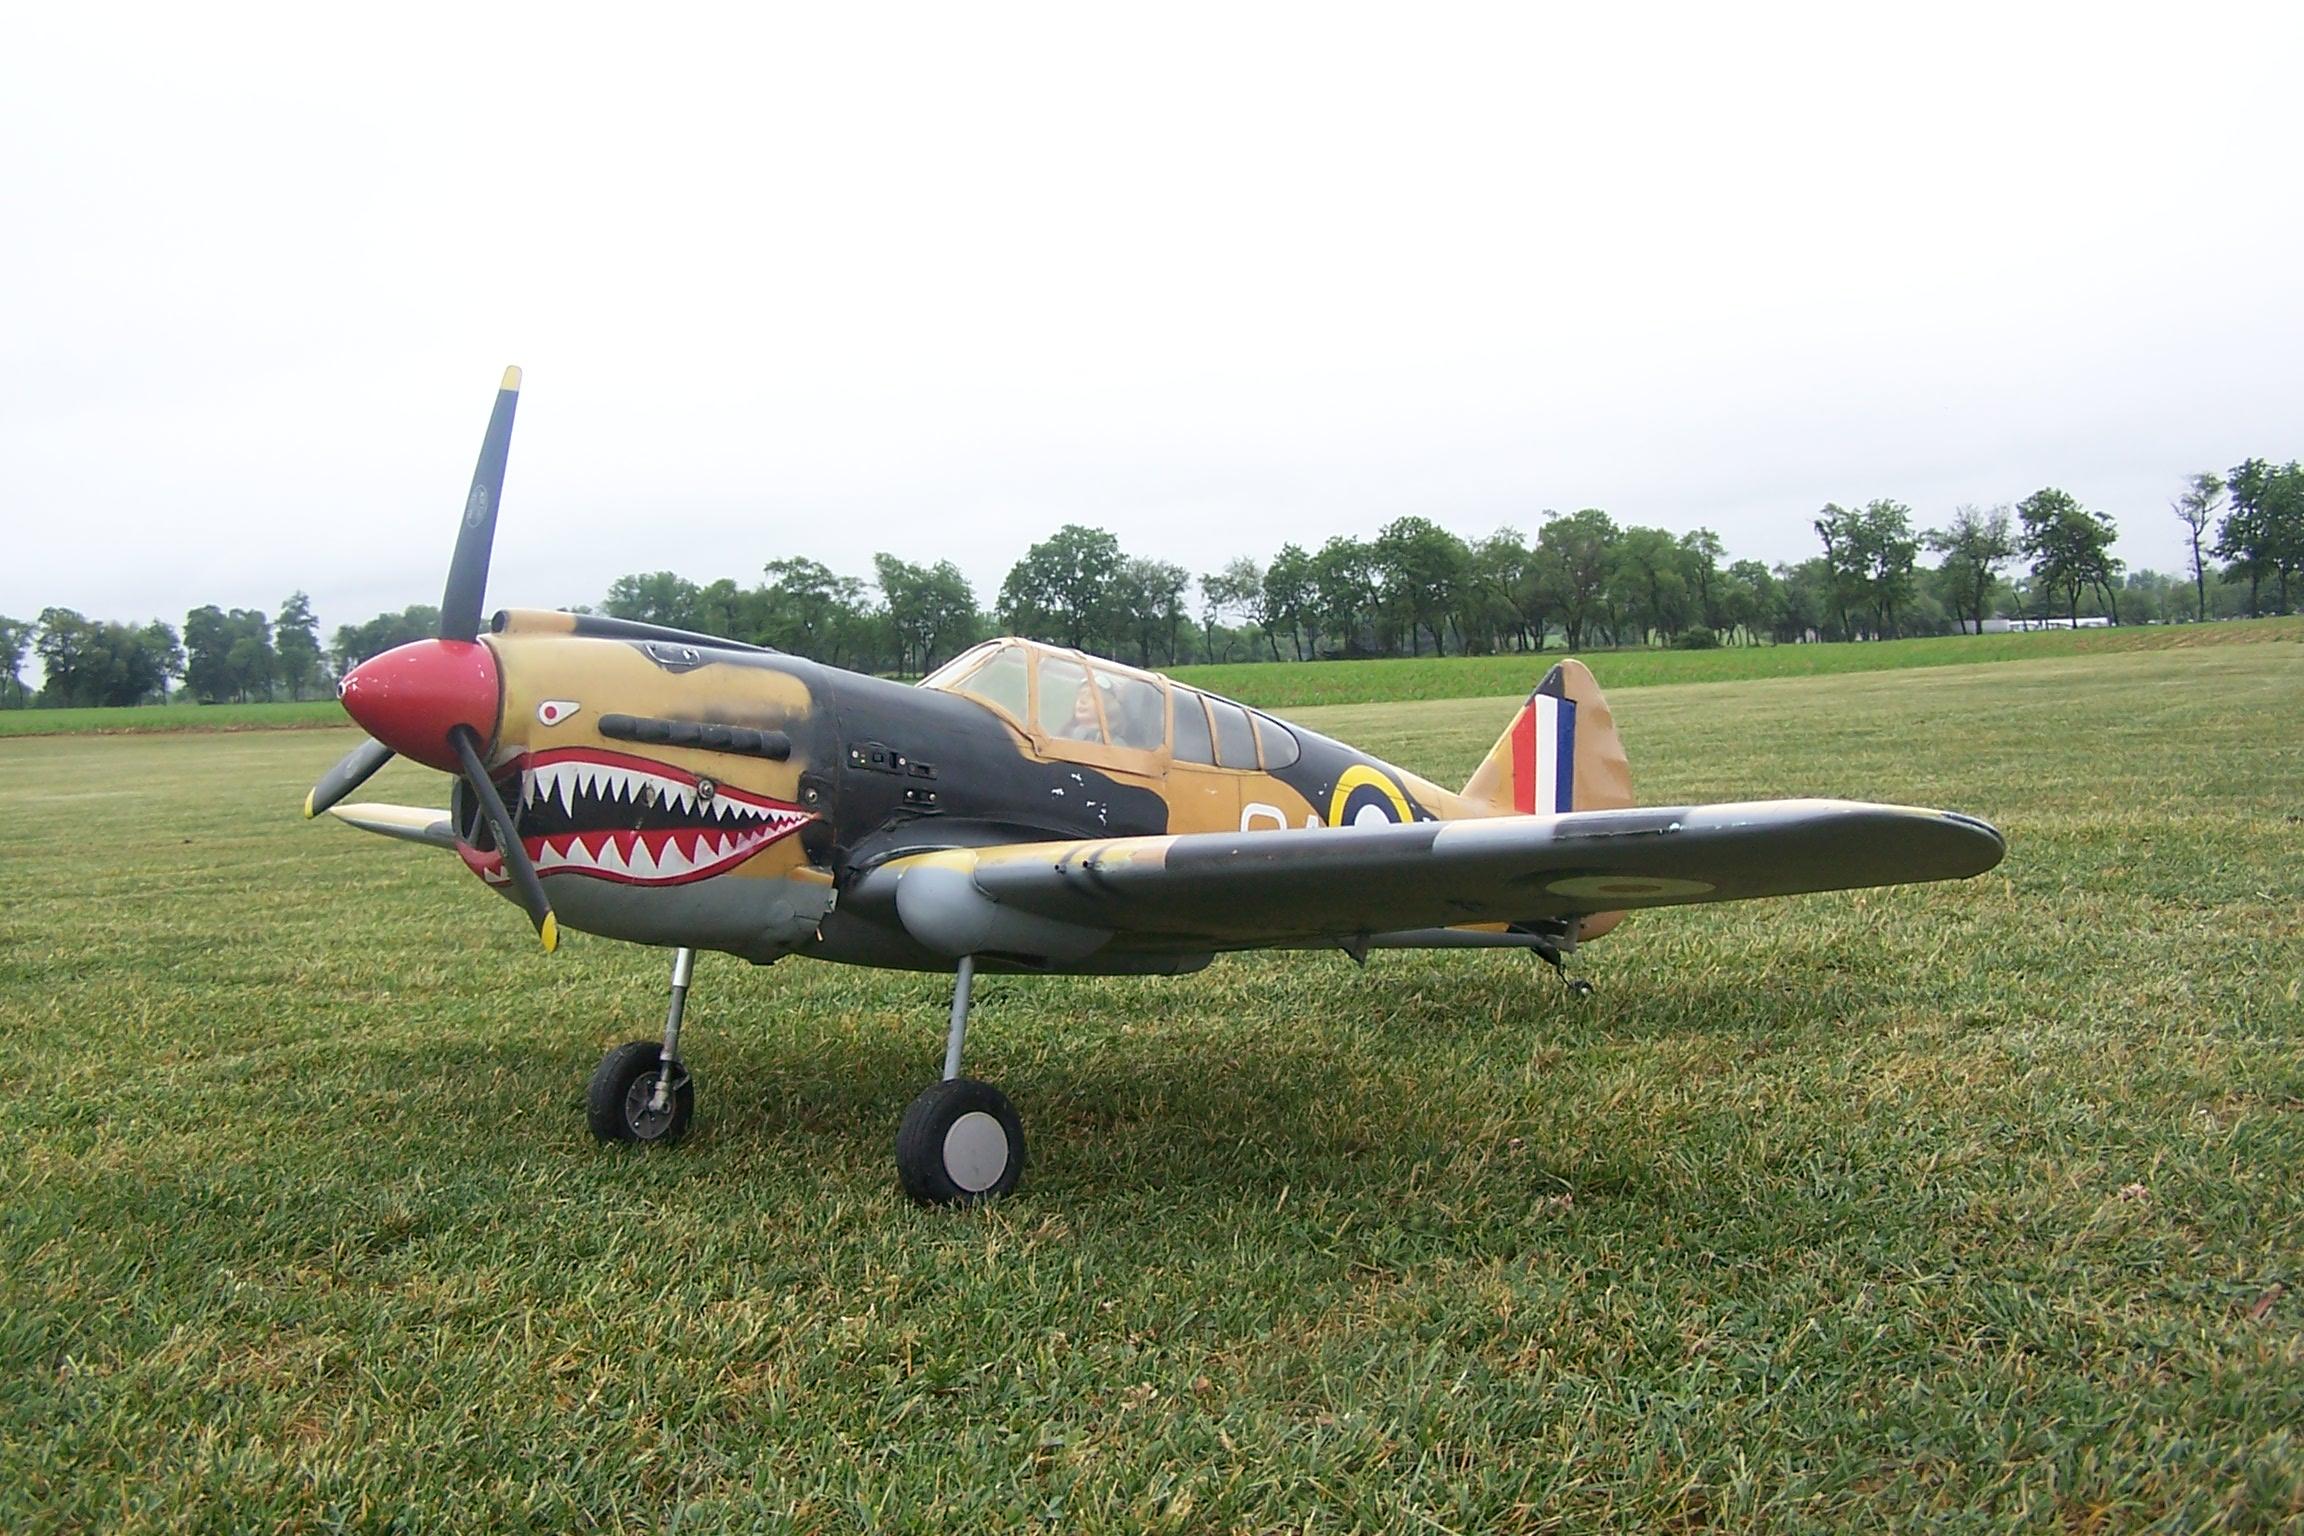 P-40 Brotherhood (All P-40's Welcome) - Page 56 - RCU Forums